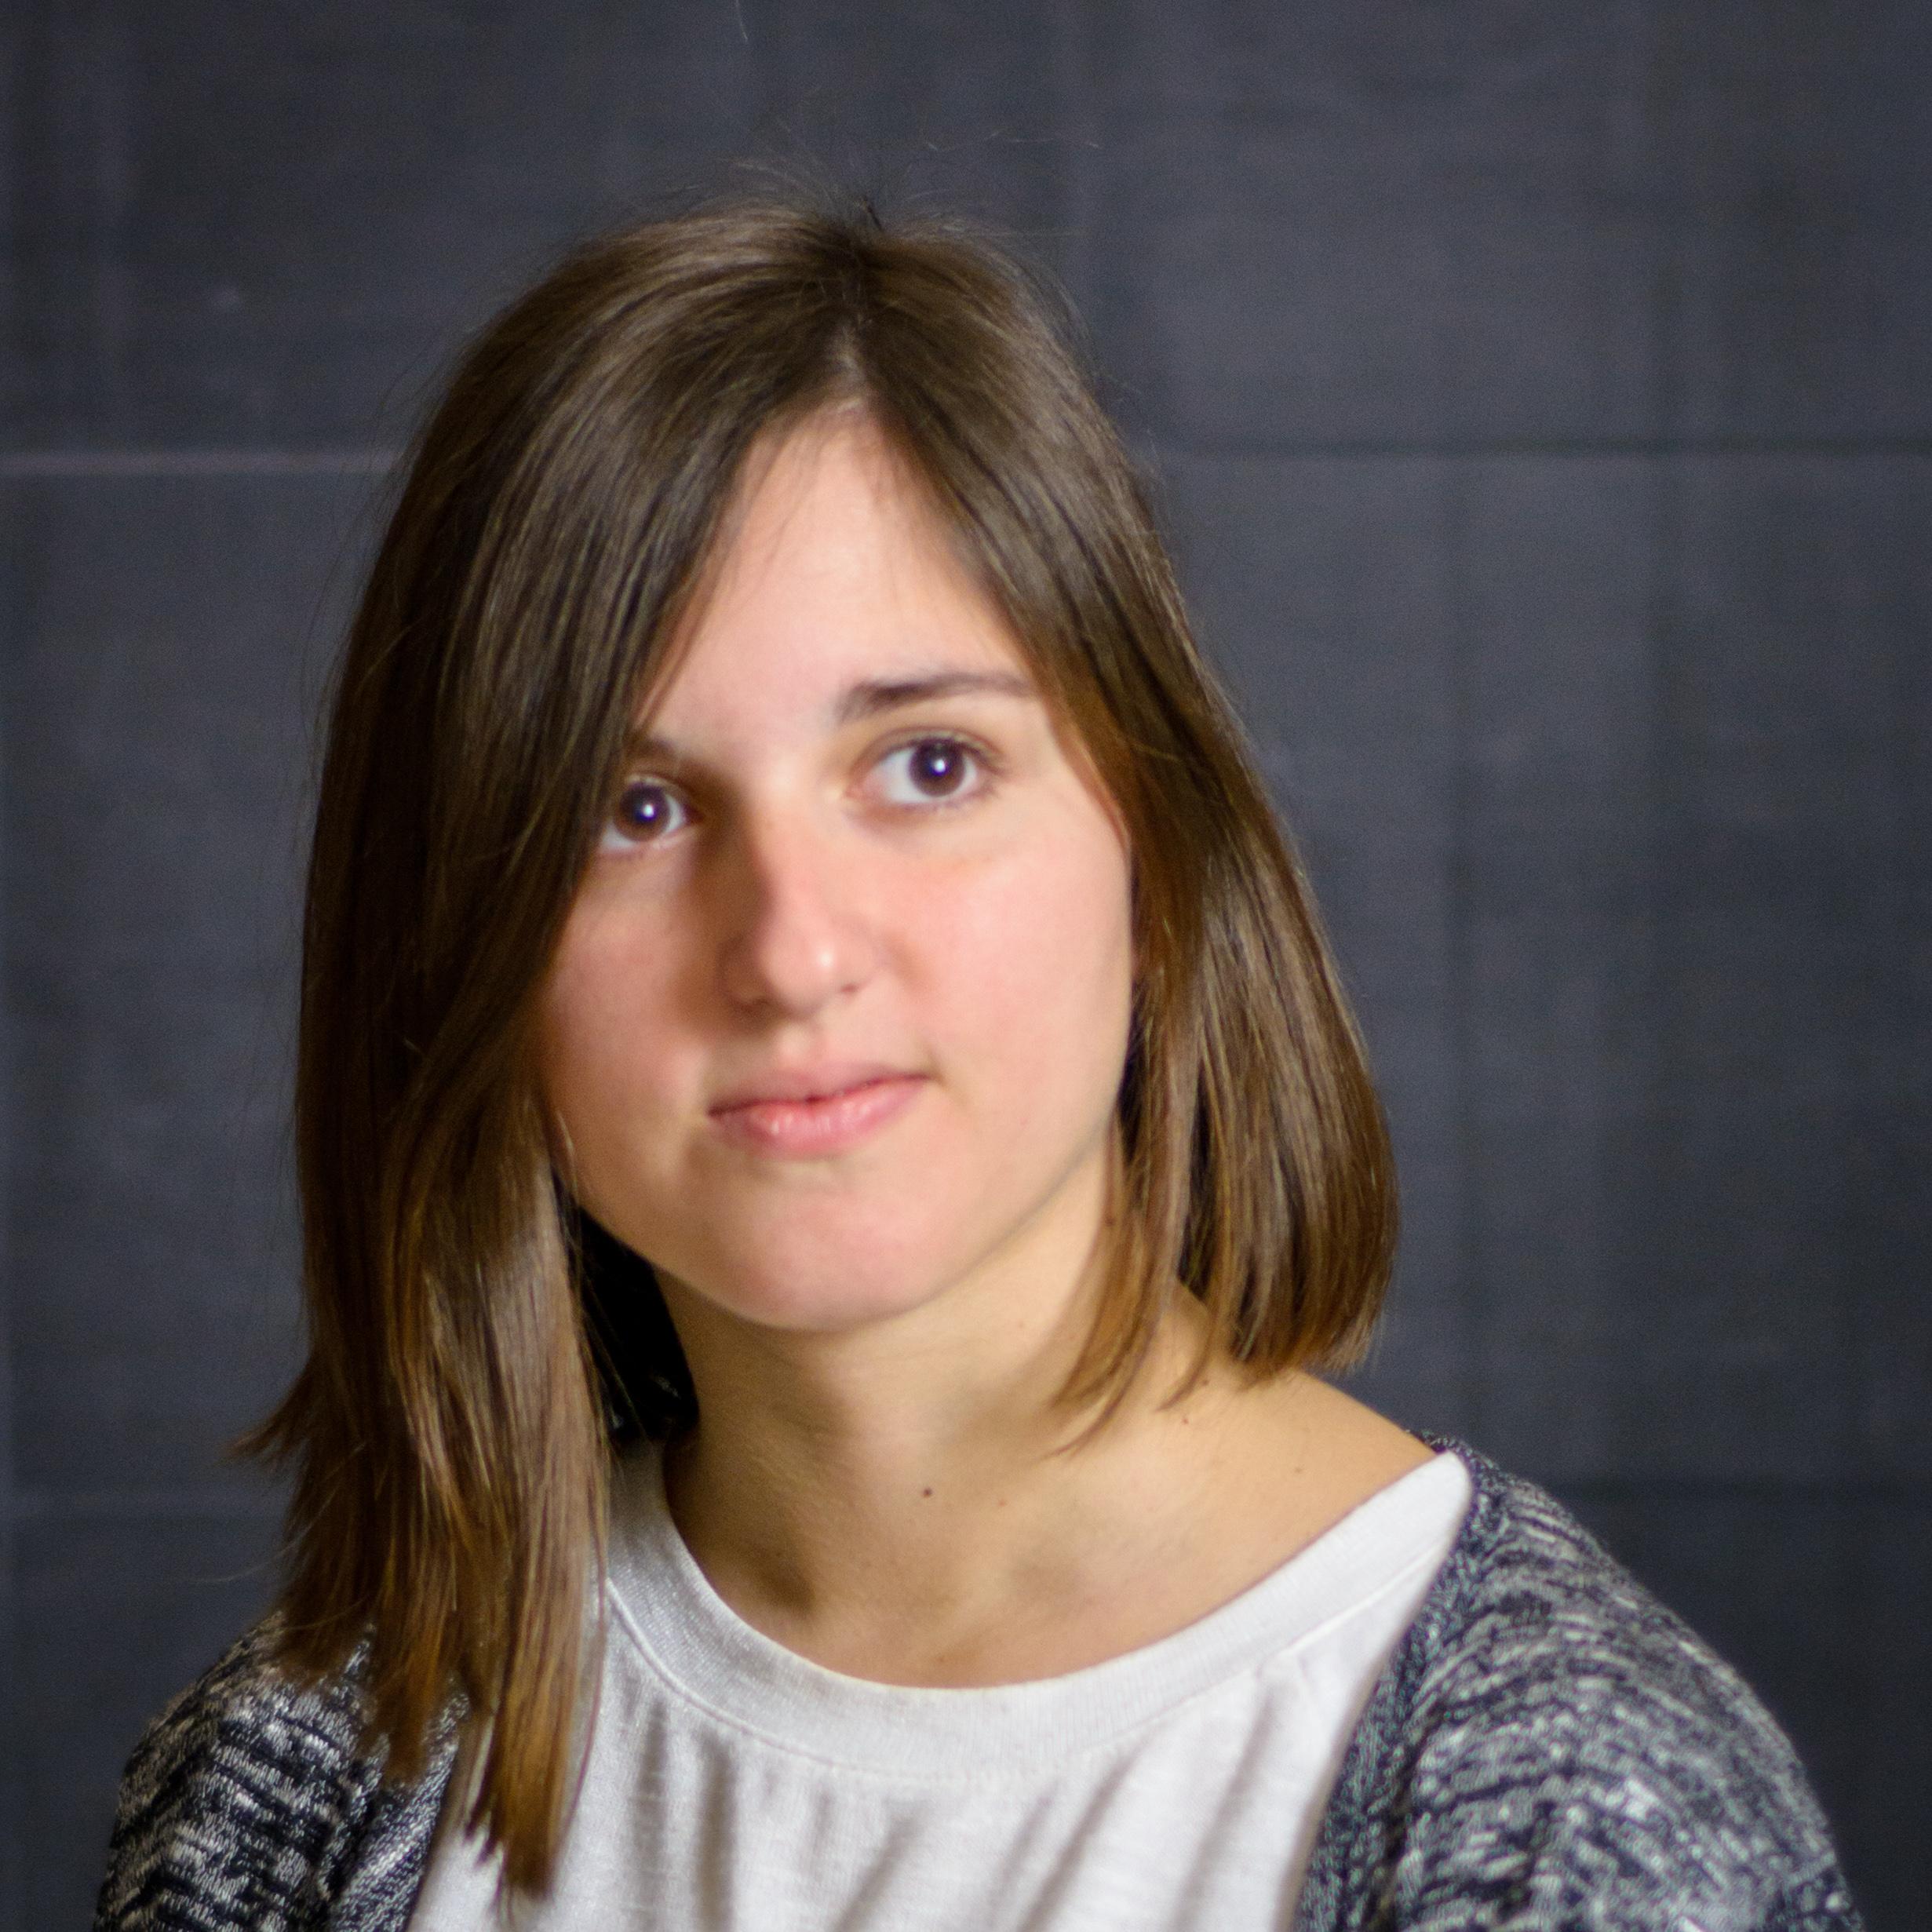 Alexandra Medeiros